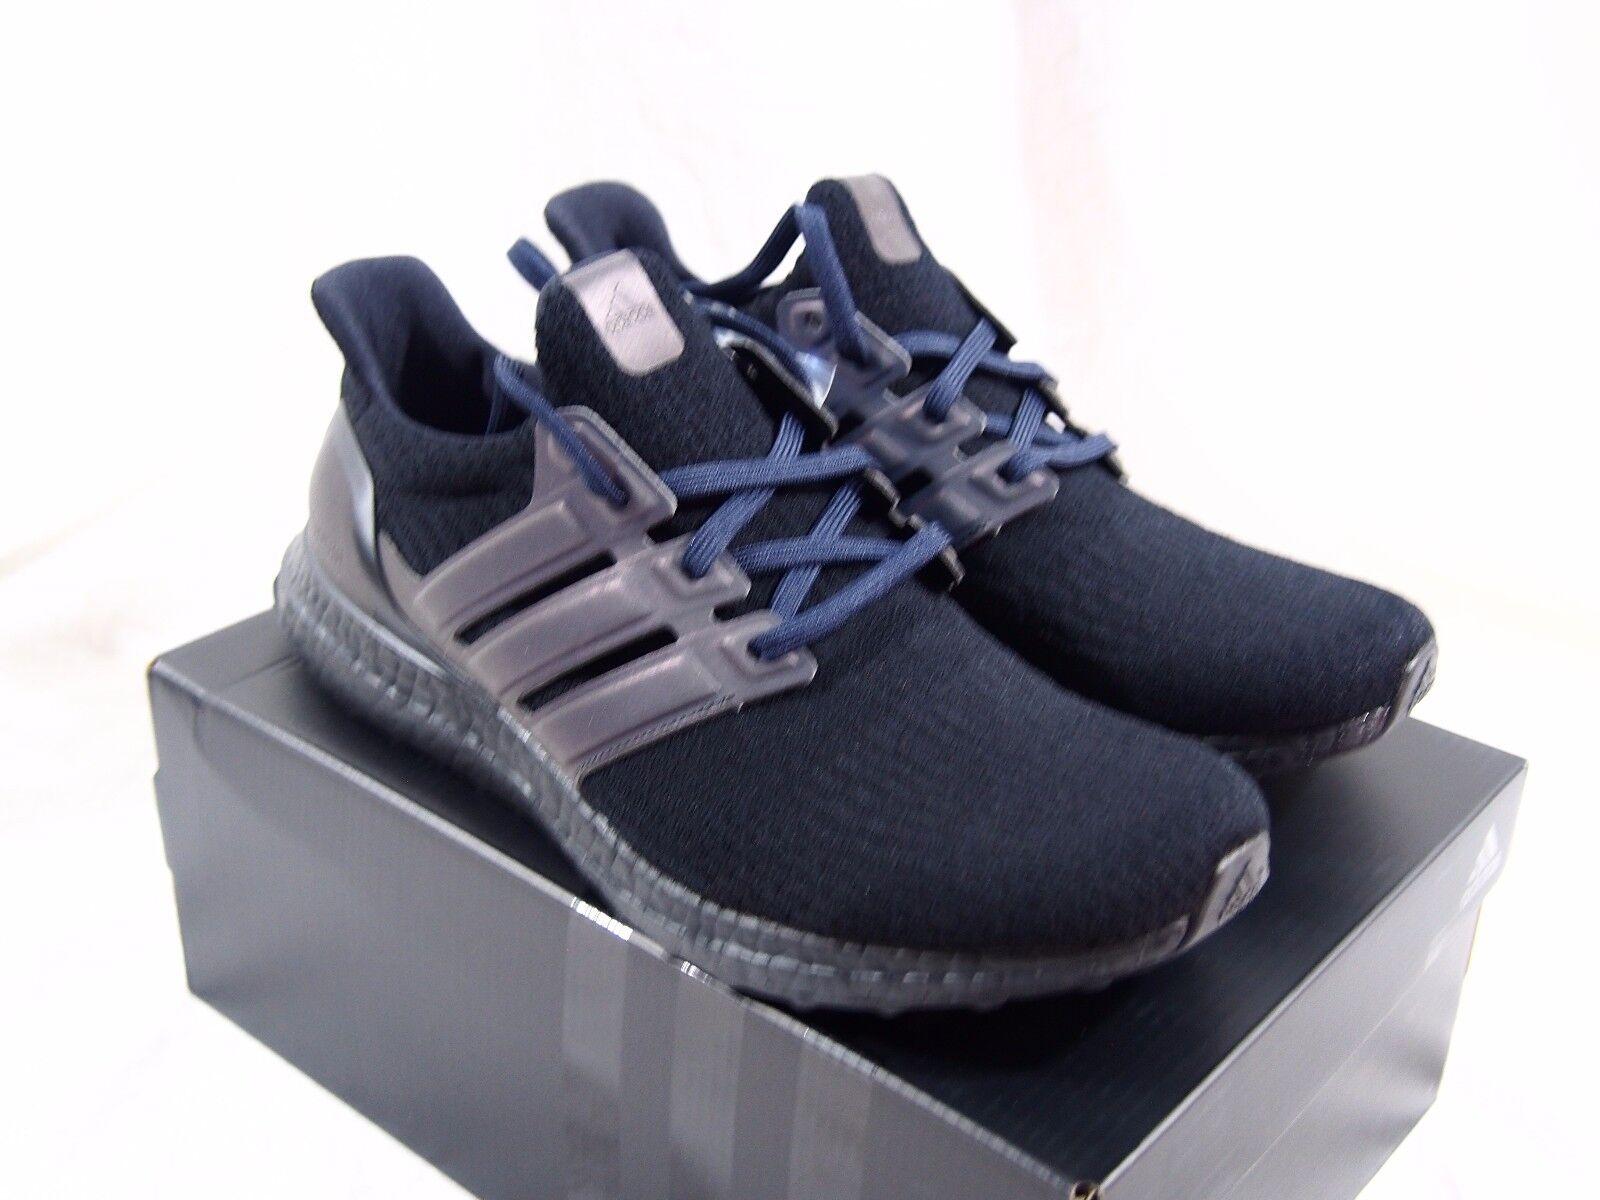 Adidas Ultra Boost XENO miAdidas Men's size 11 US